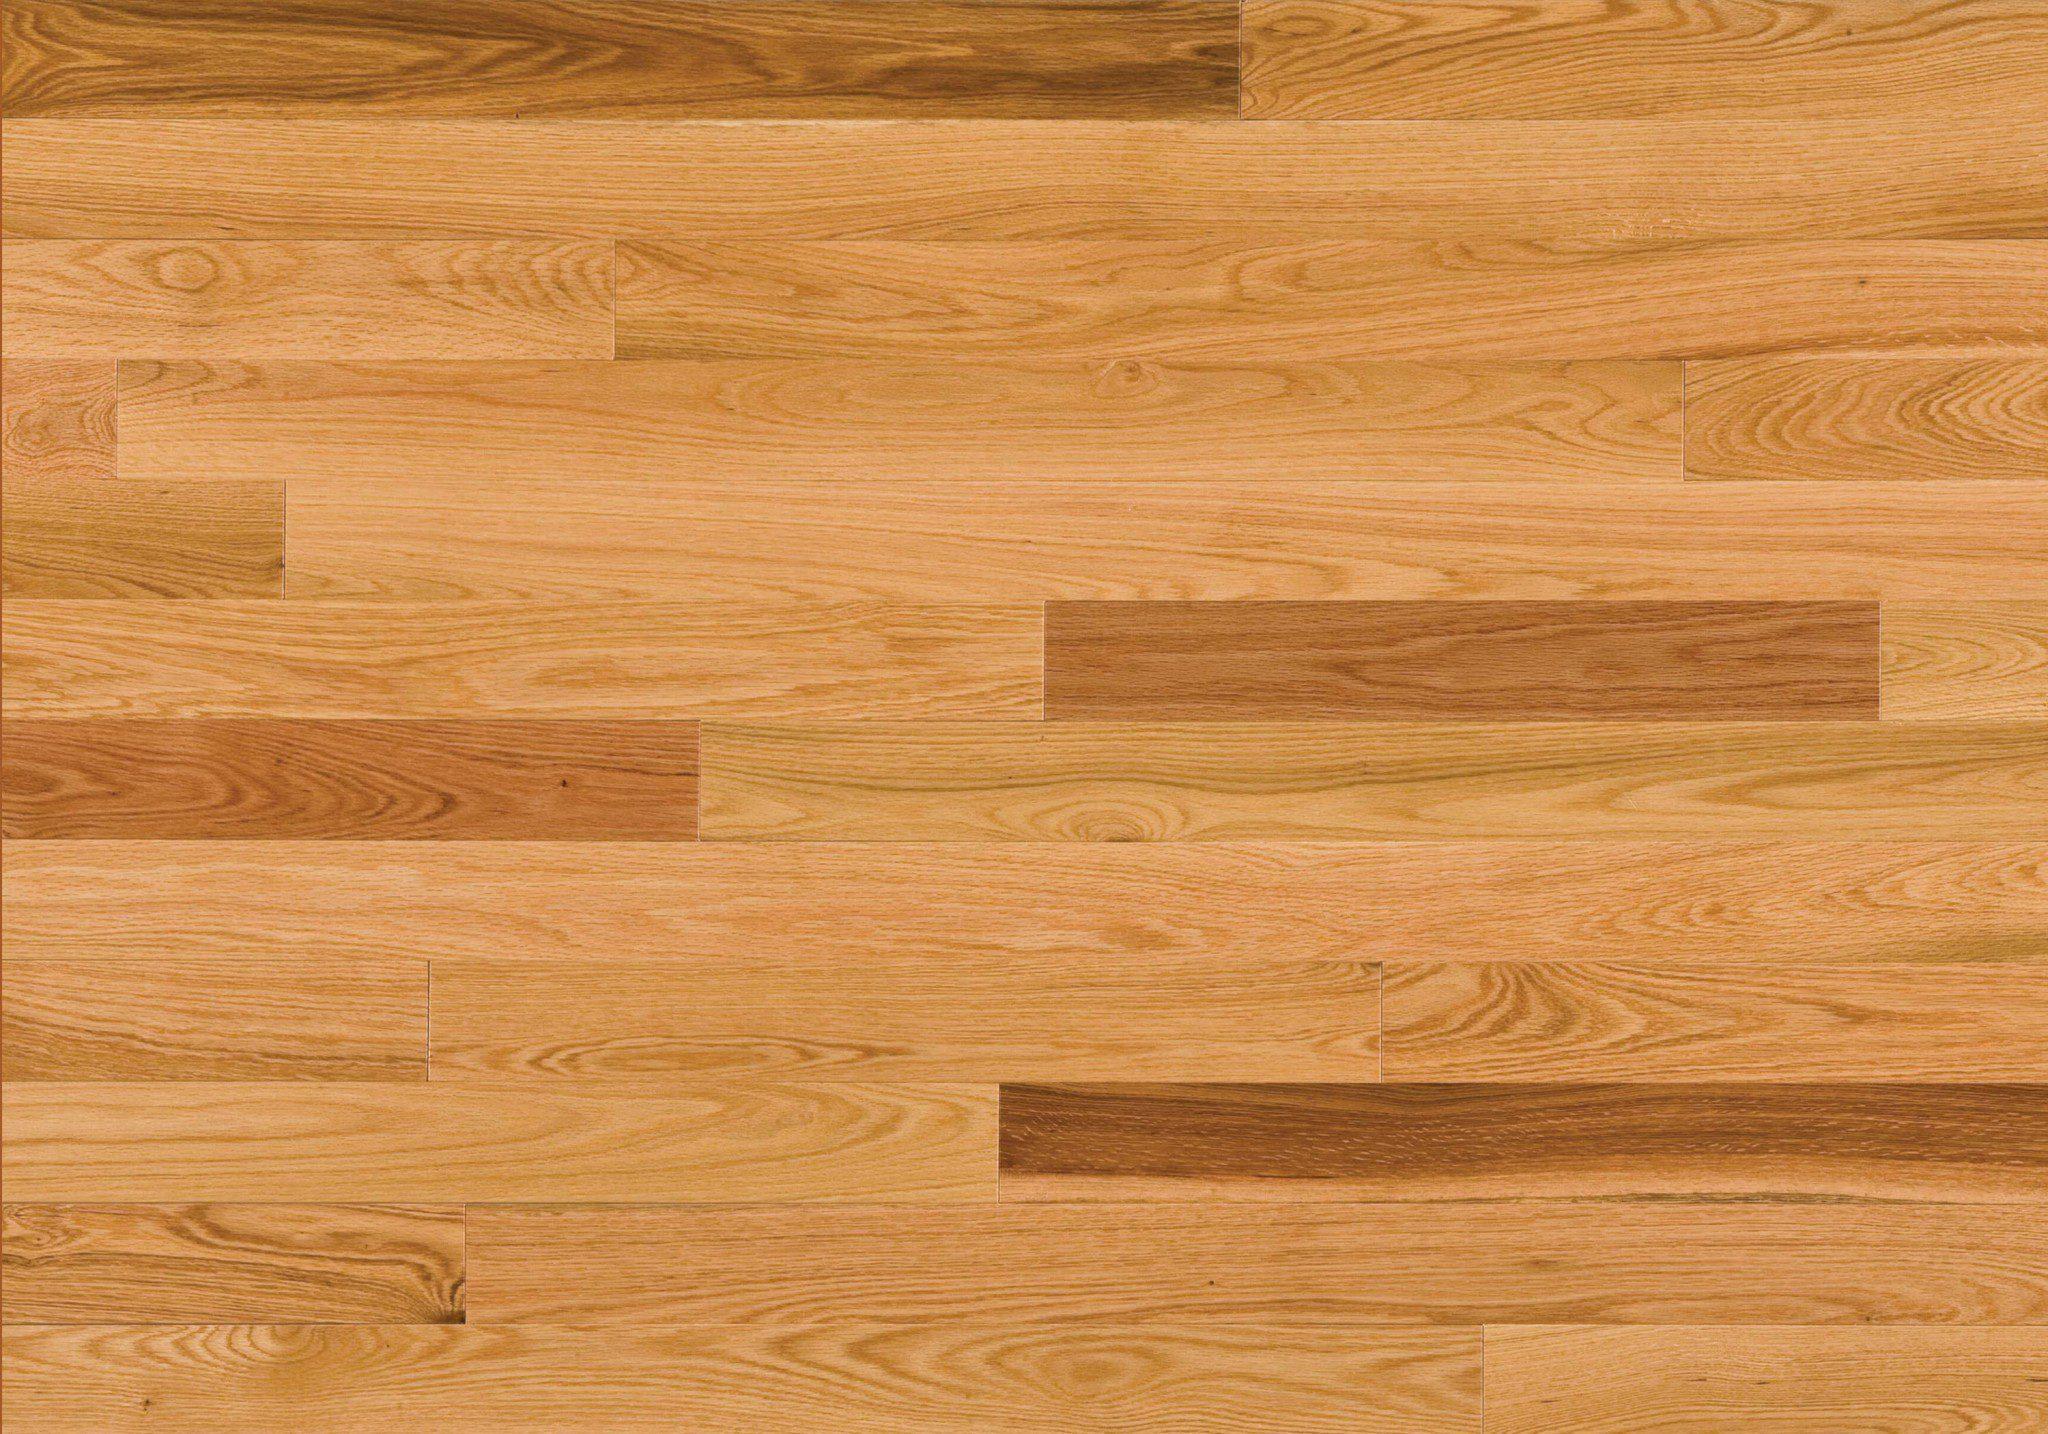 Red Oak Natural Solid Width: 3 1/4